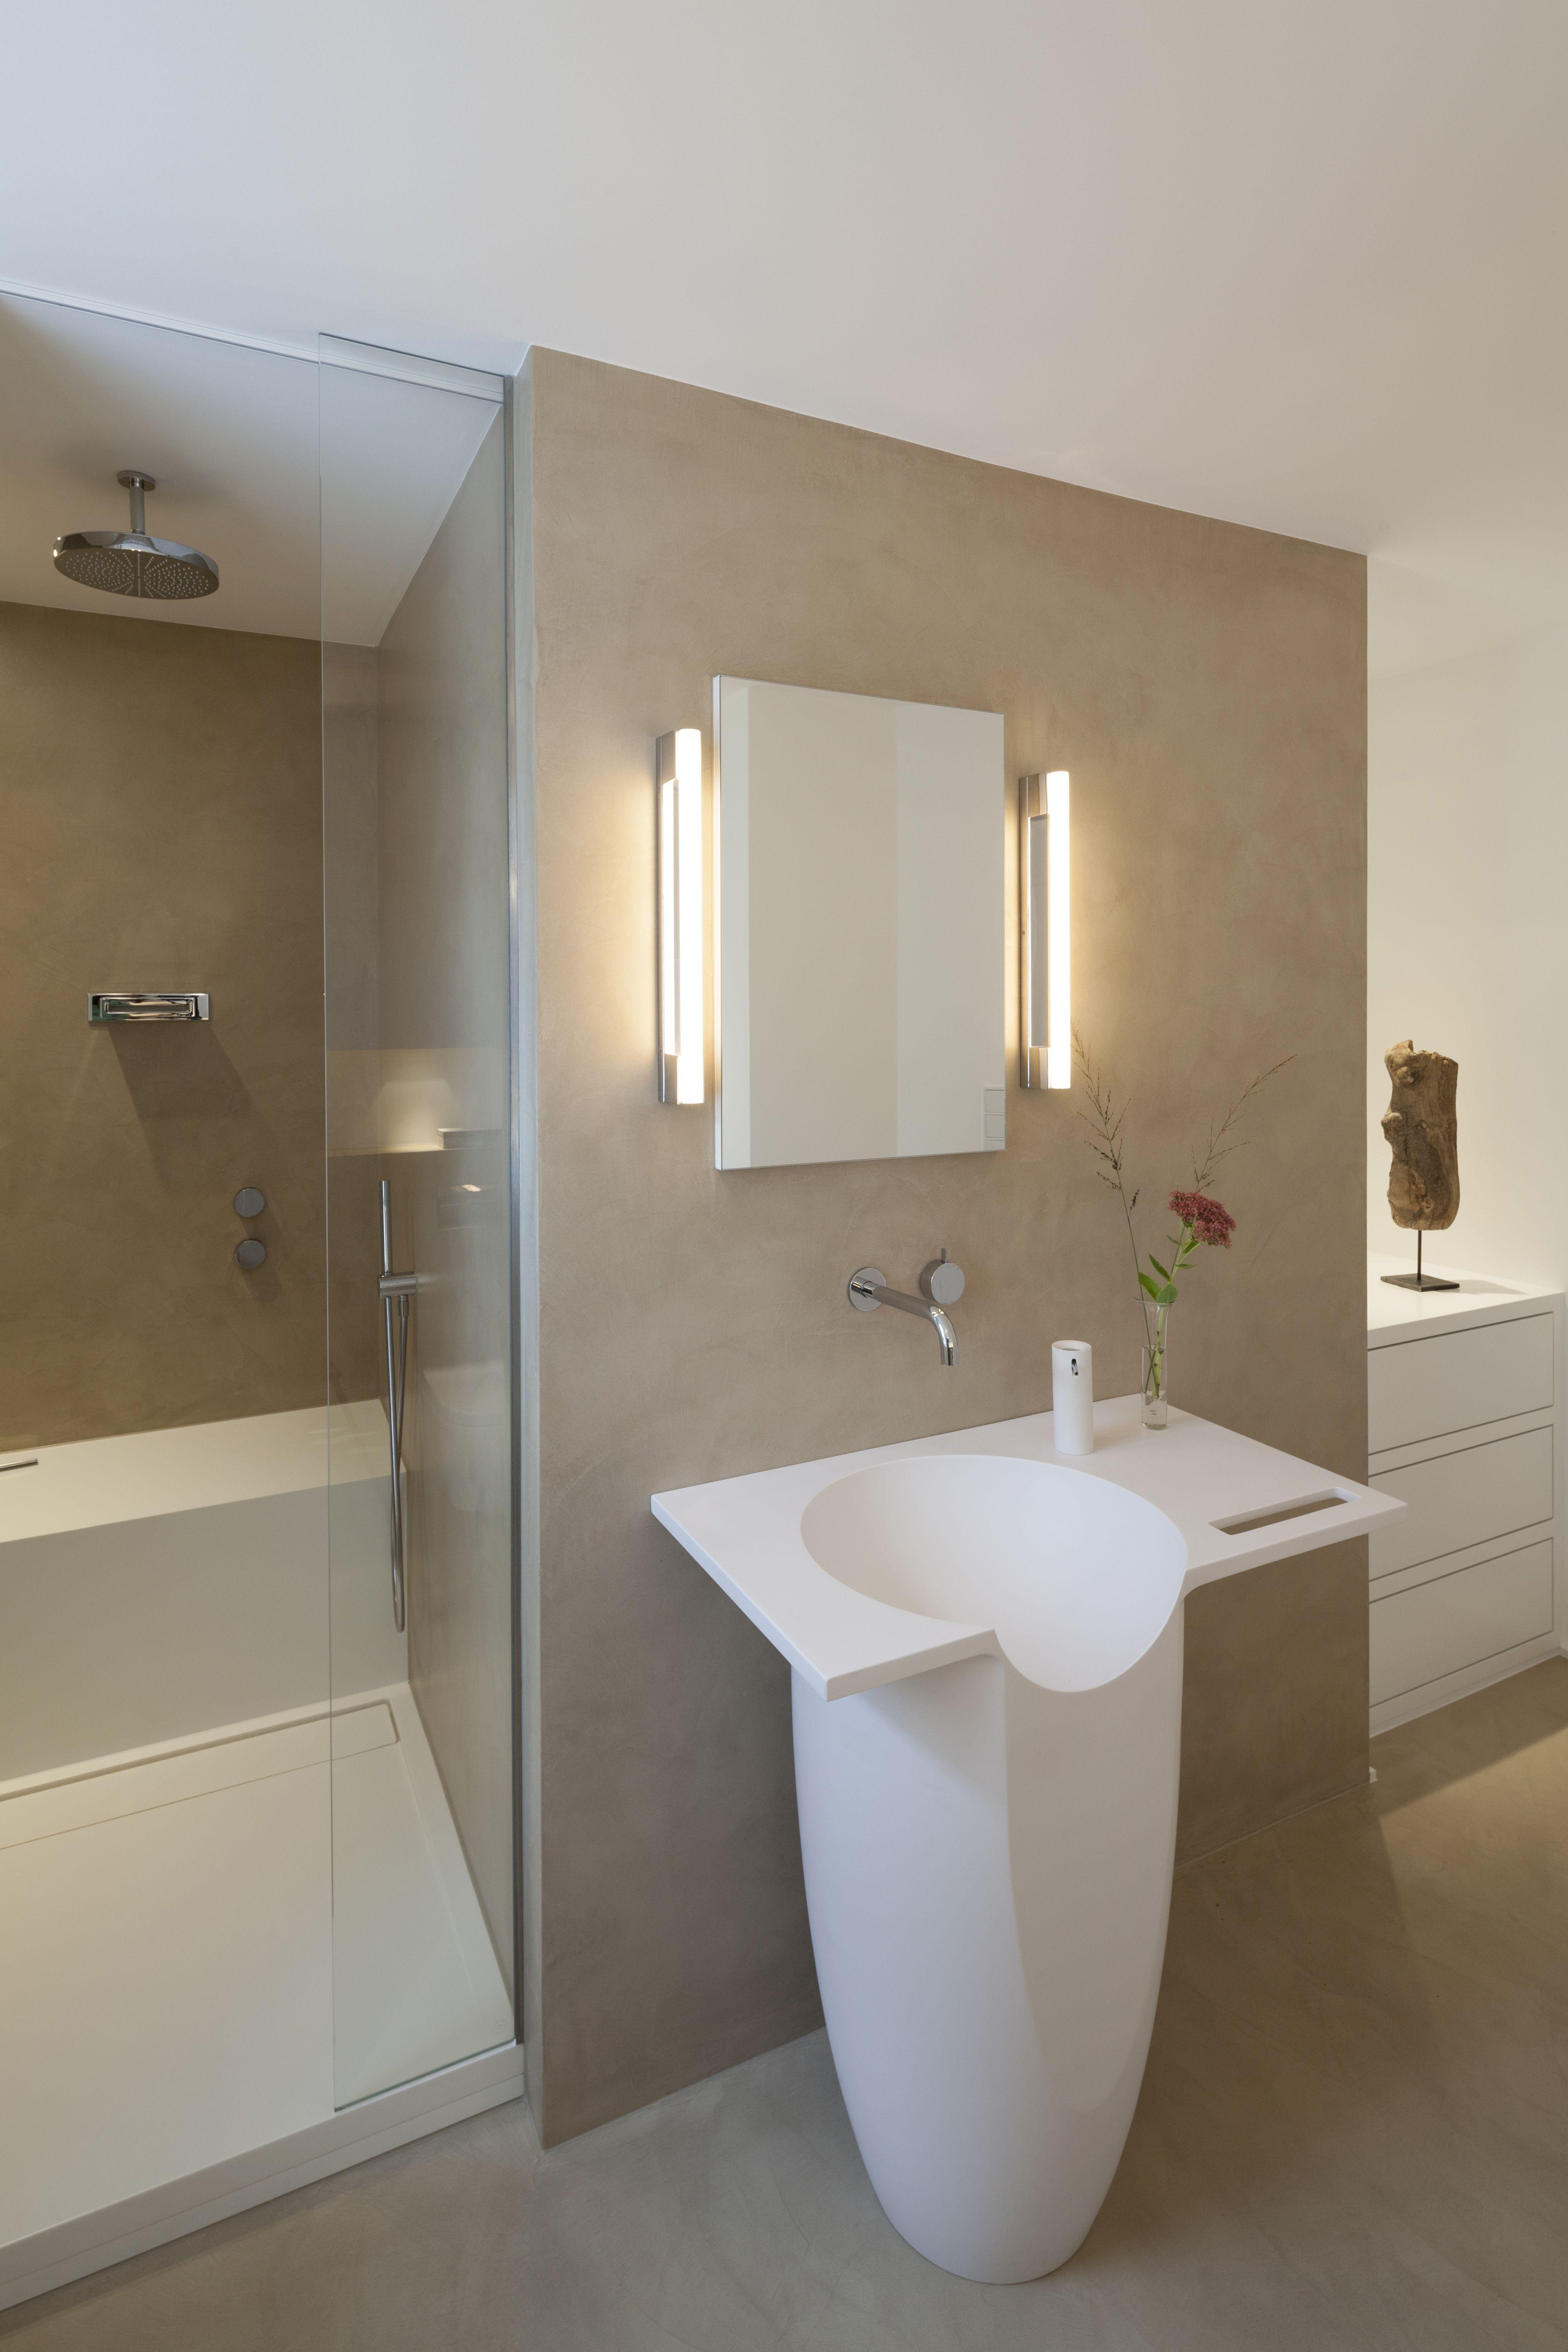 Trister Standard Nein Danke Badezimmer Modernes Badezimmer Neues Zuhause